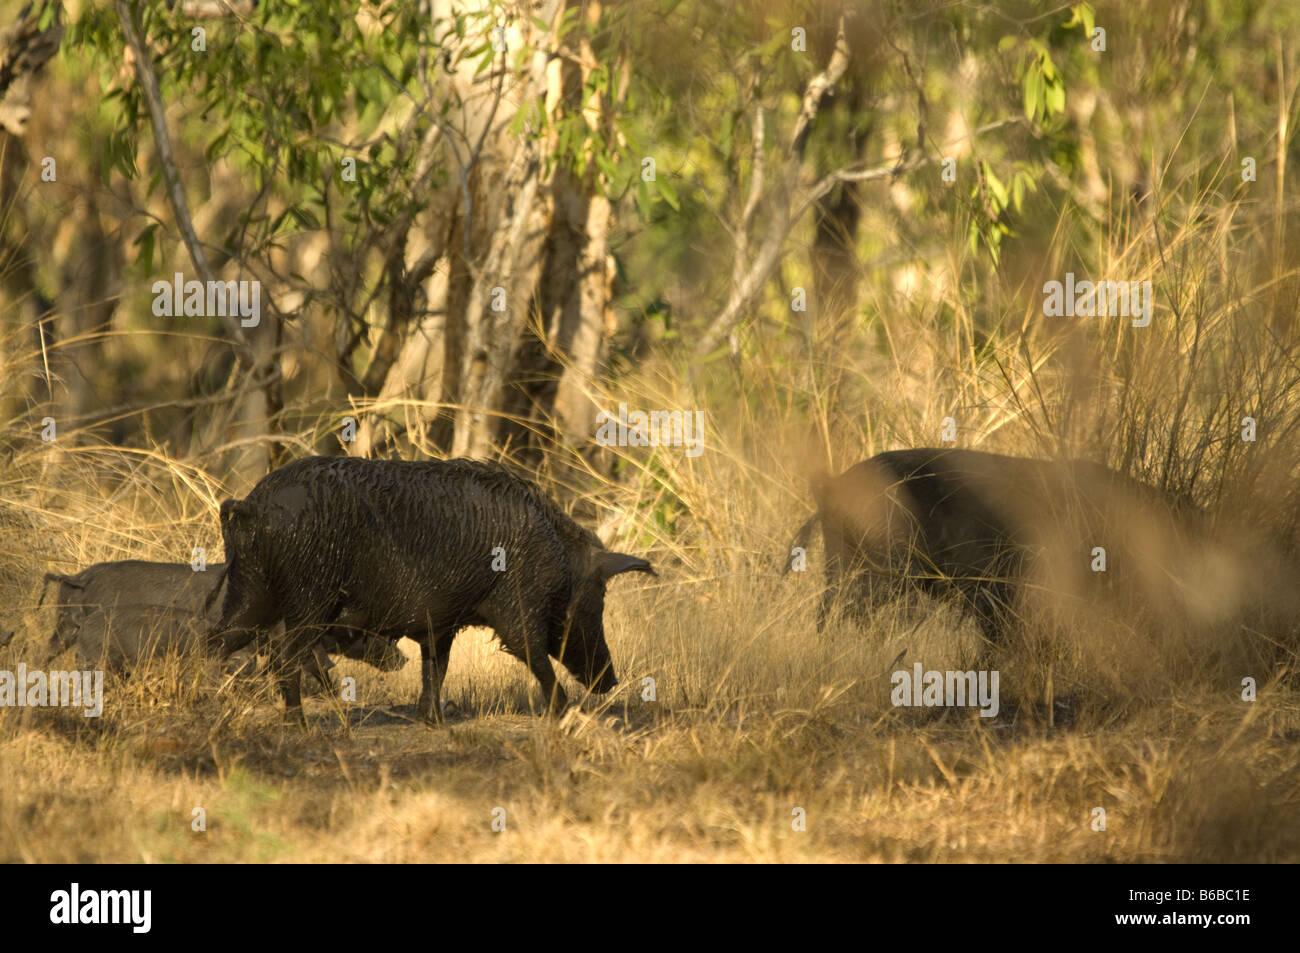 Das wilde Schwein (Sus Scrofa) mit jungen Fremdarten Anbangbang Kakadu National Park Northern Territory Australien Stockbild